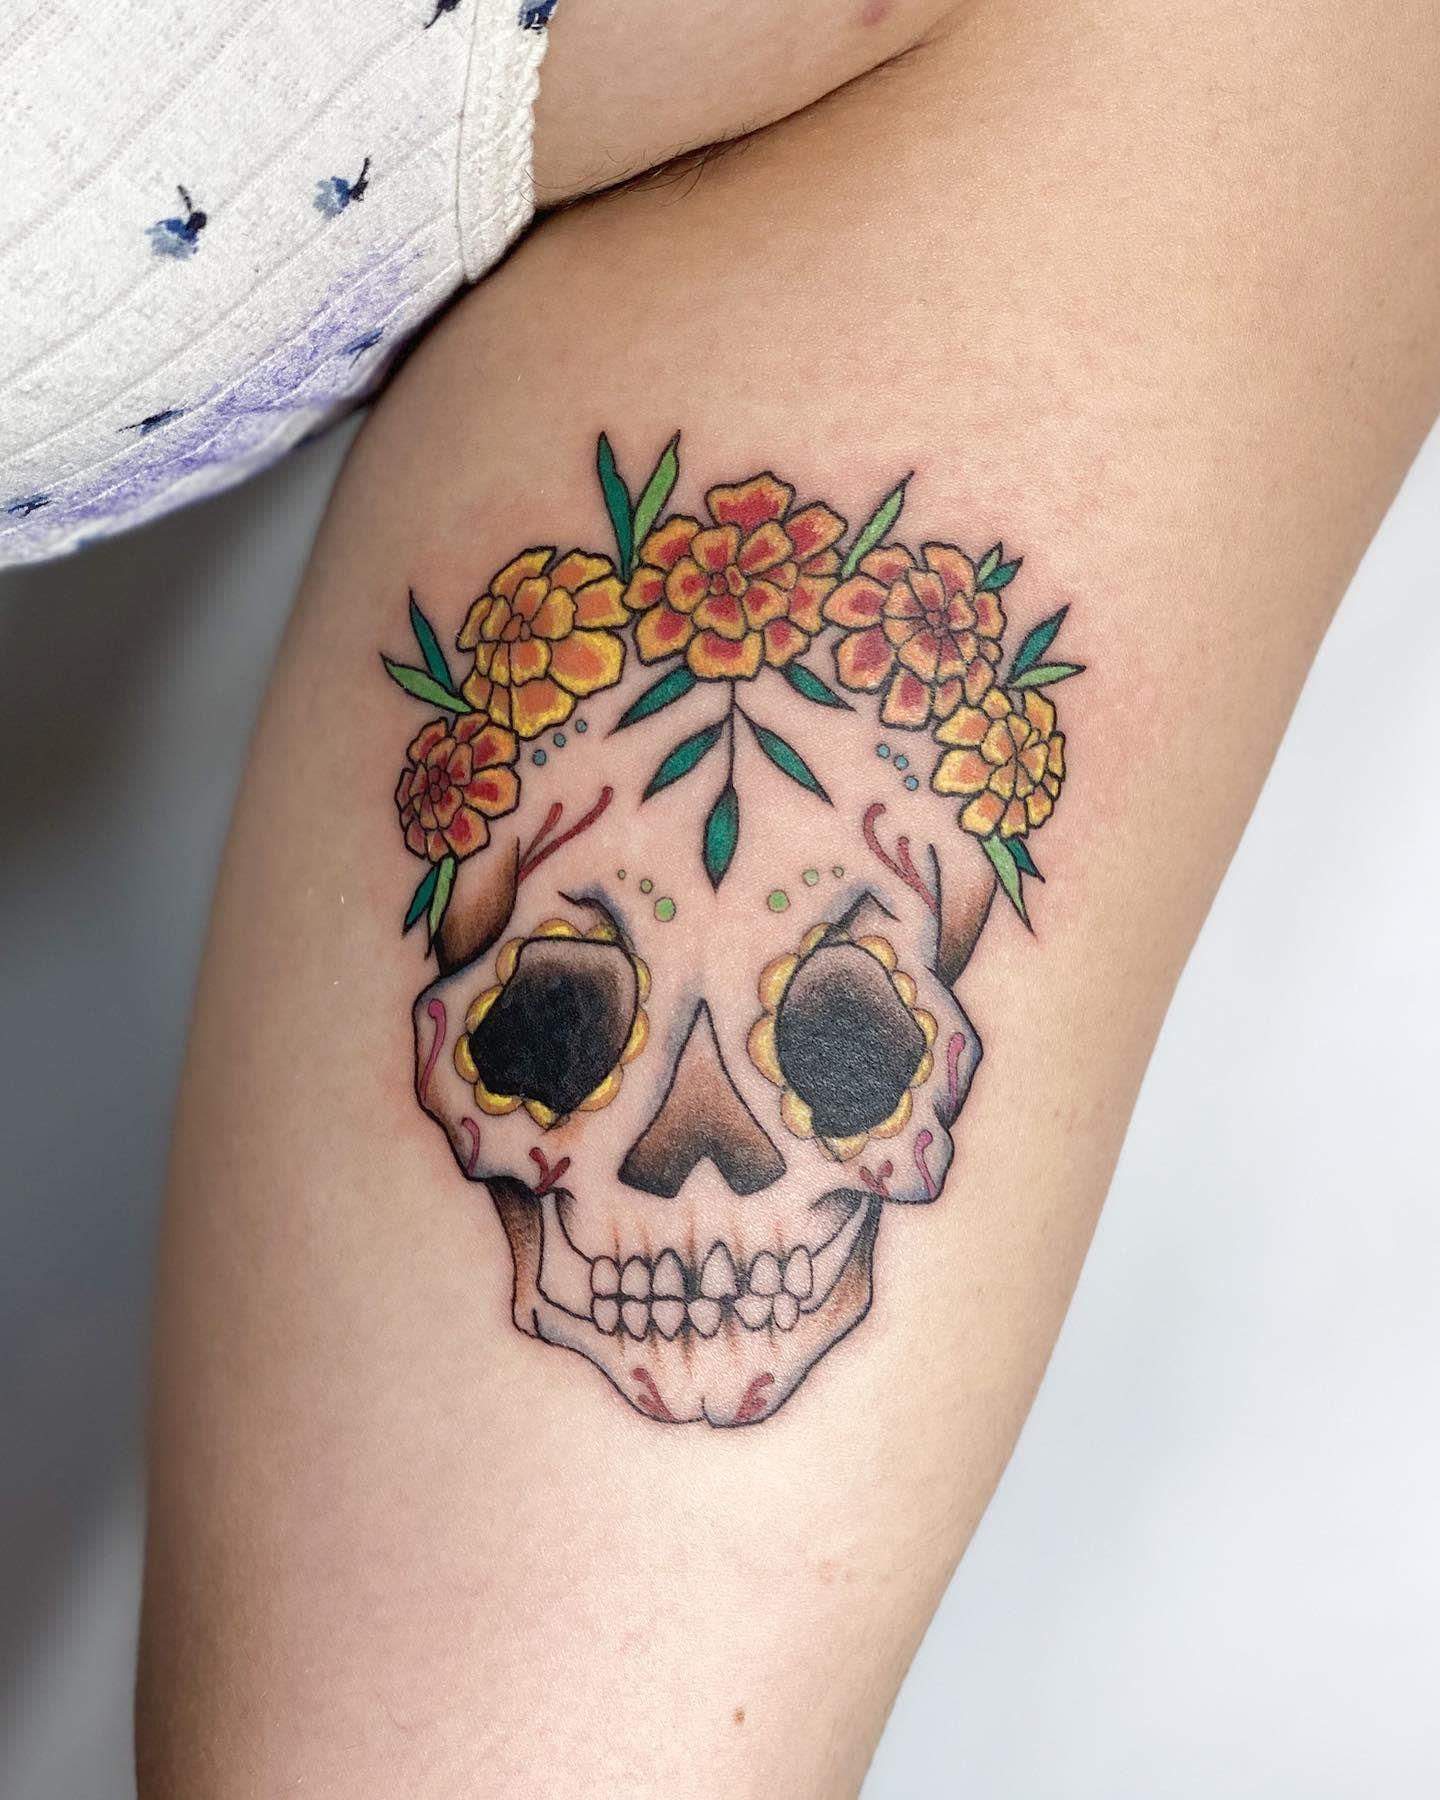 Top 65 Best Marigold Tattoo Ideas [2020 Inspiration